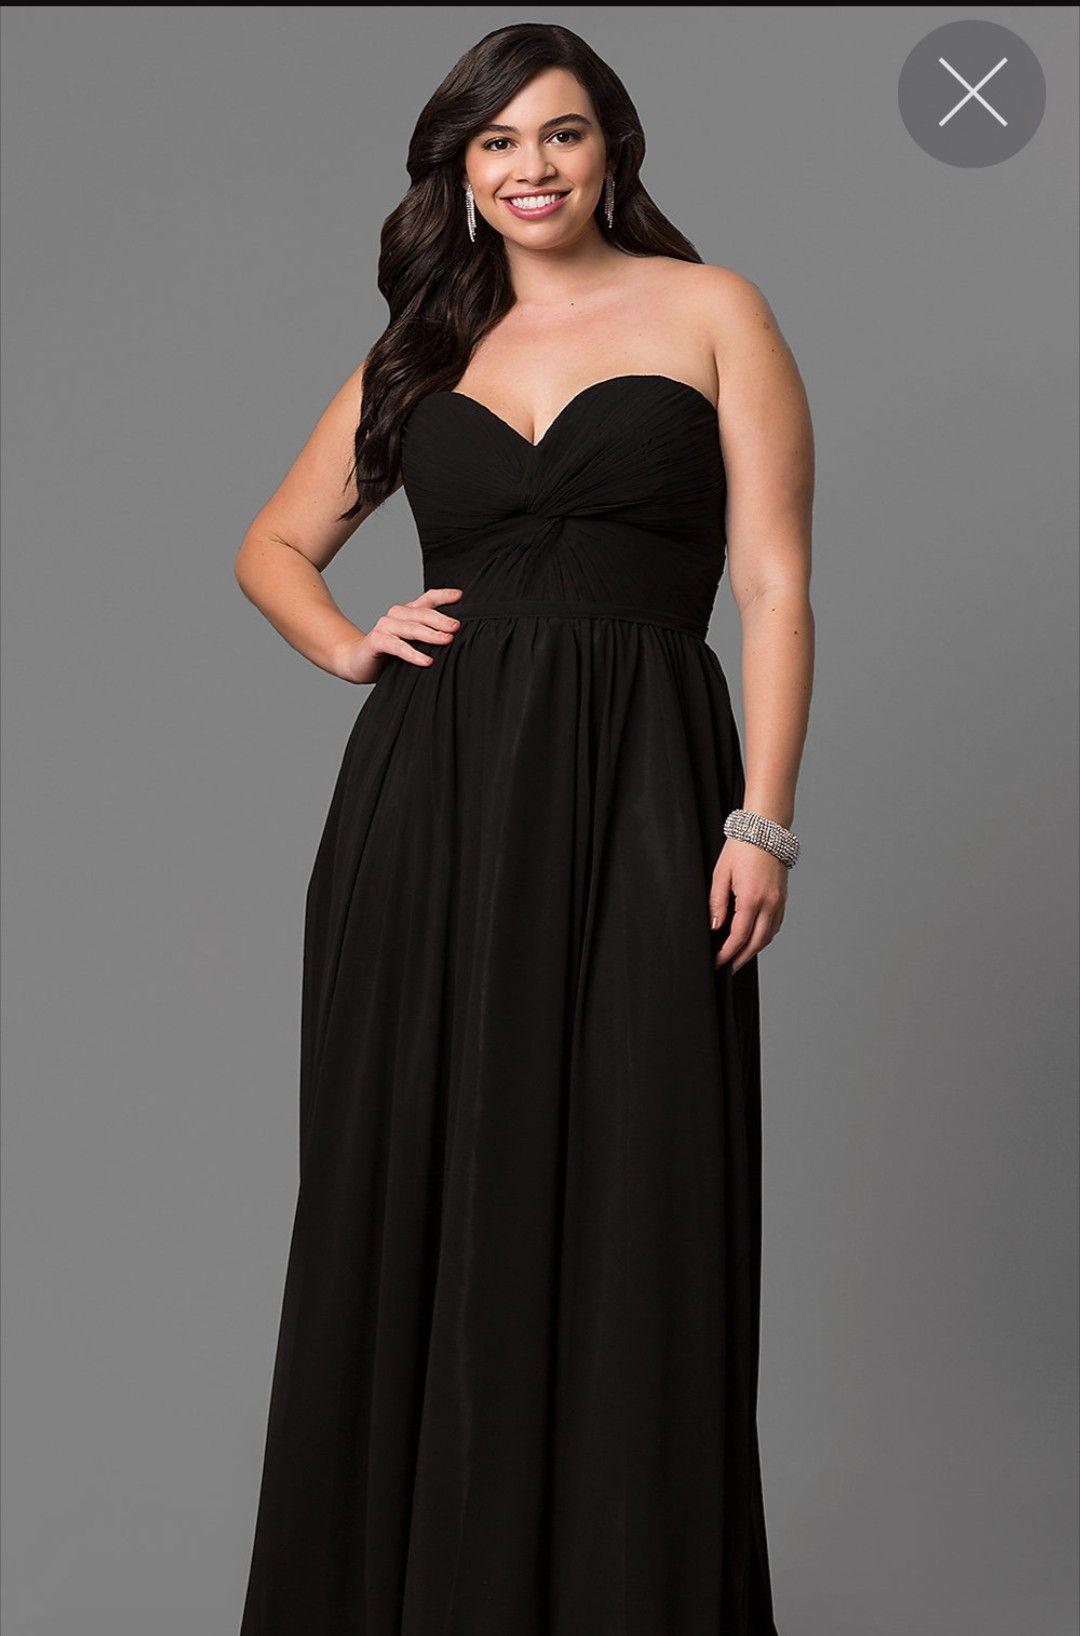 Plus Size Prom Dress Black Simple Long No Sleeves Plus Size Prom Dresses Black Prom Dresses Plus Size Prom [ 1636 x 1080 Pixel ]